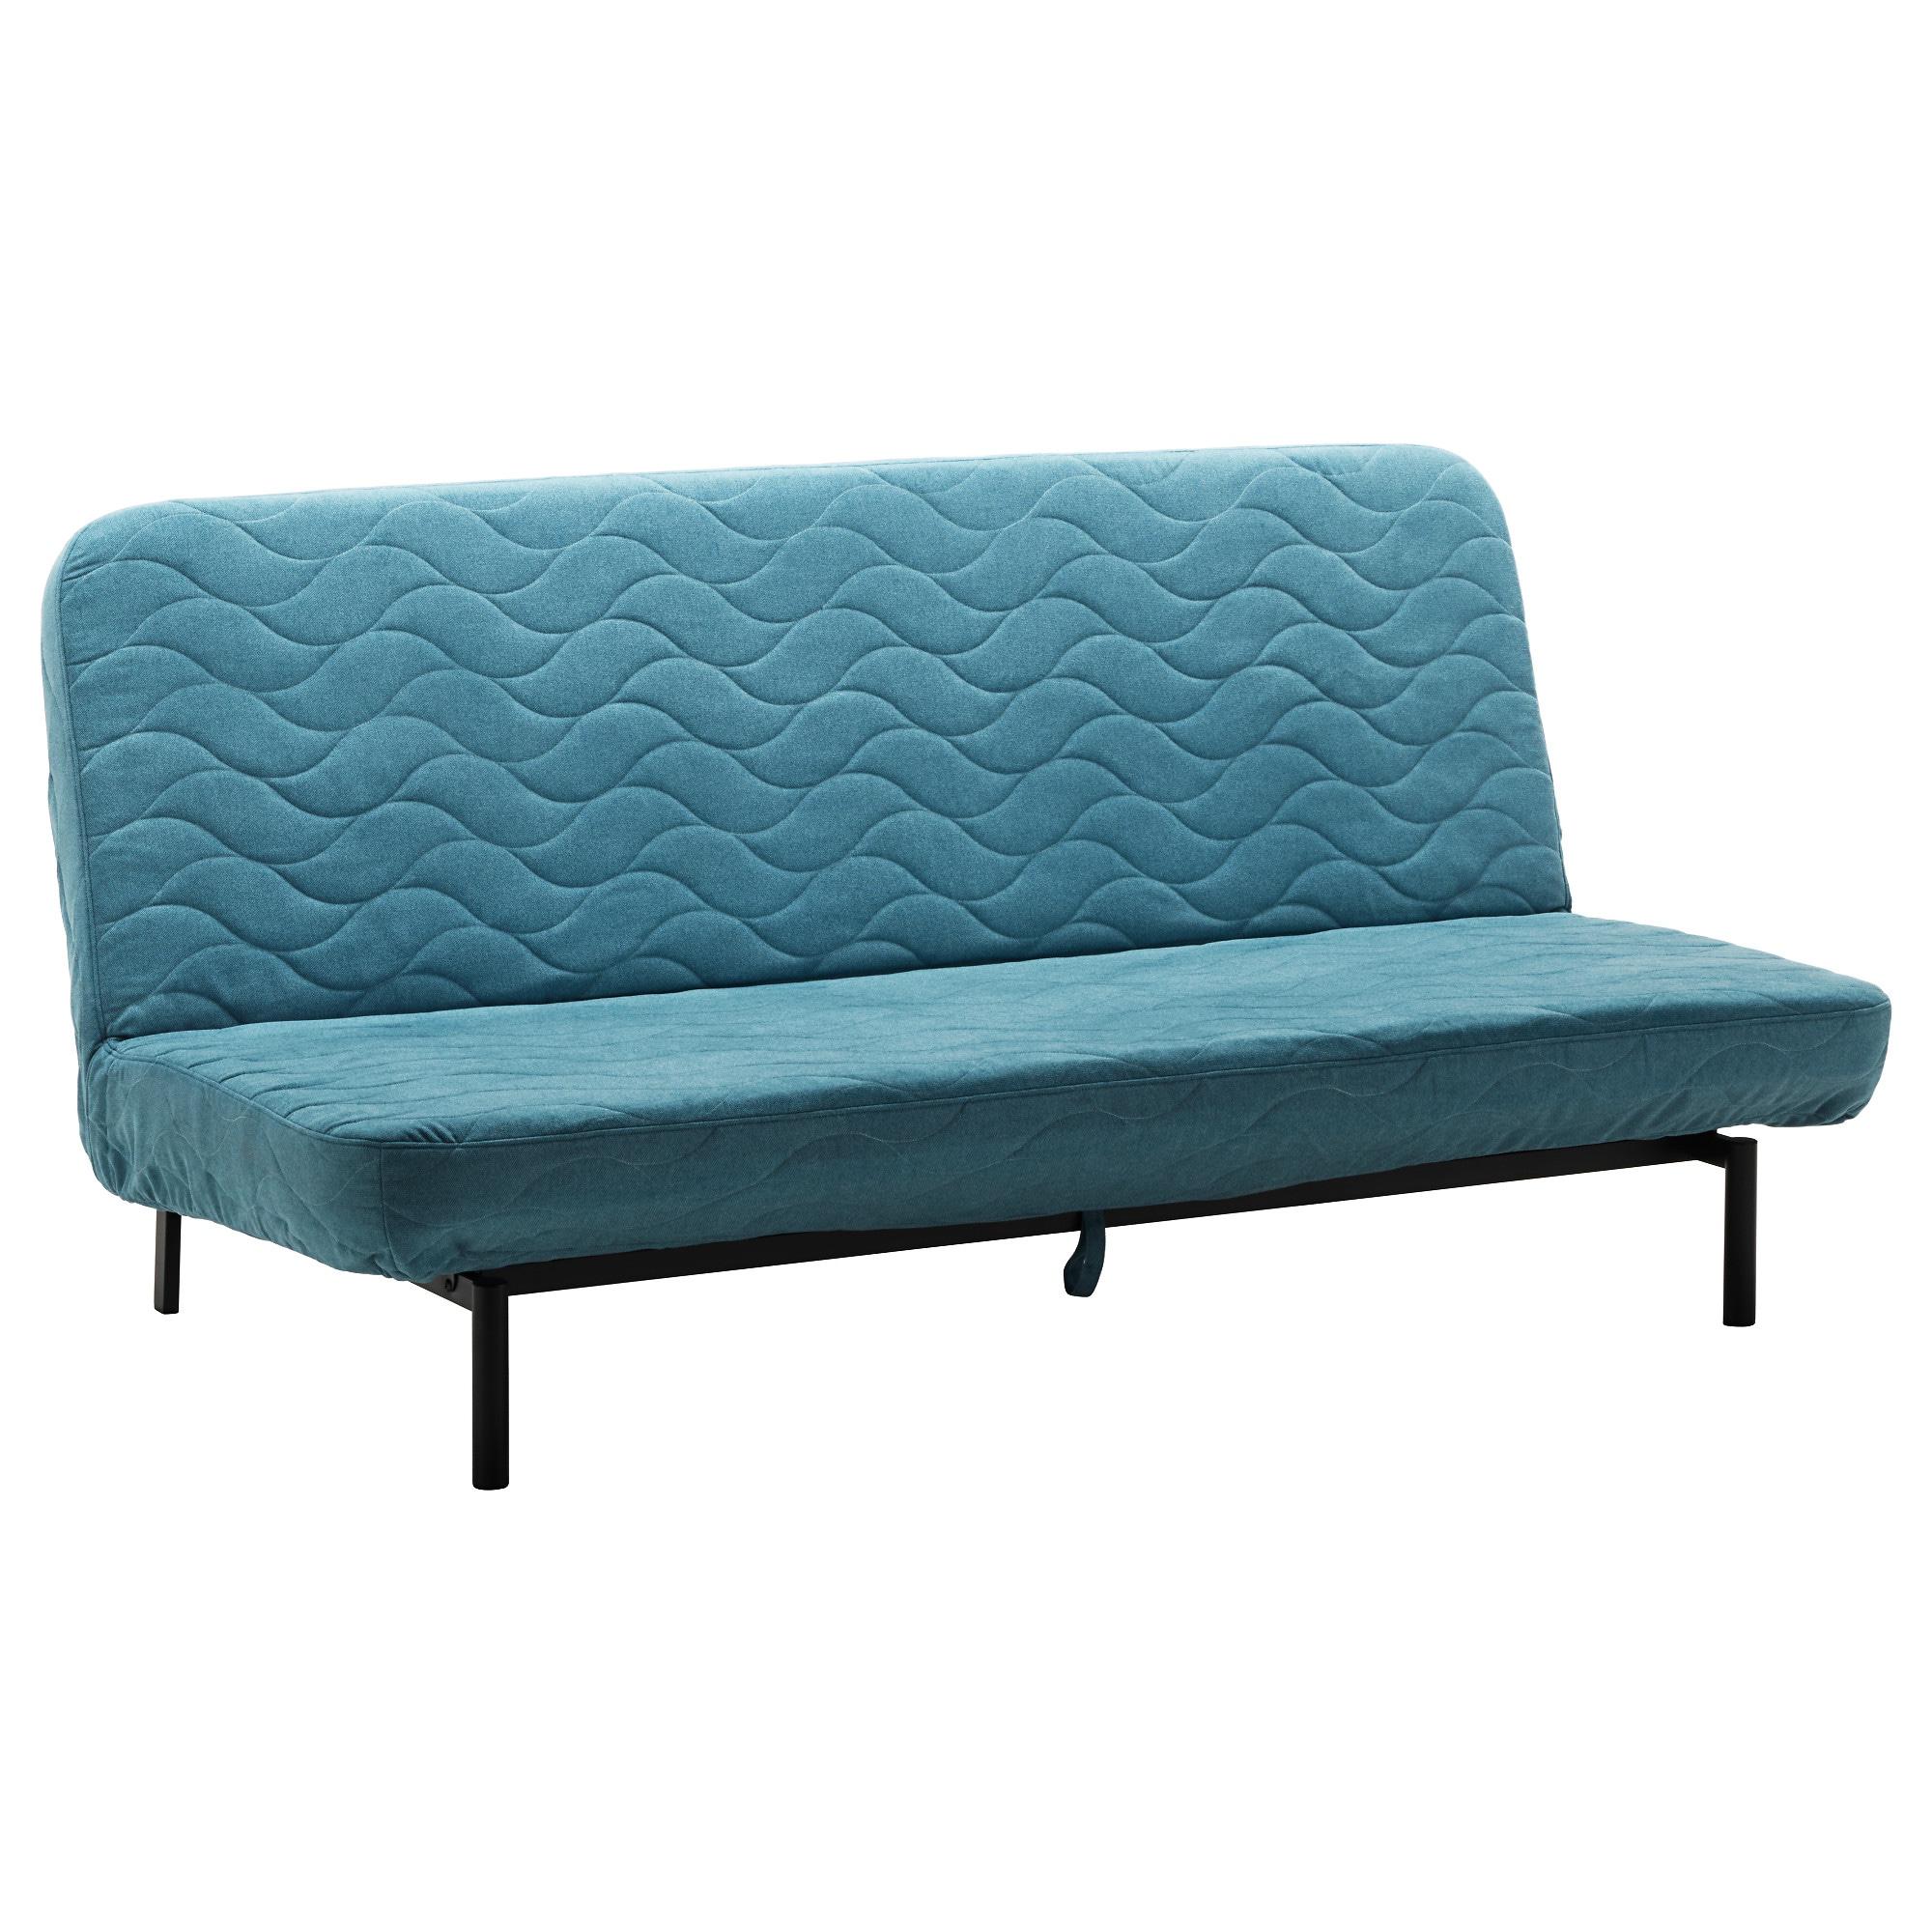 Sillon Cama 1 Plaza Merkamueble 3id6 sofà S Cama De Calidad Pra Online Ikea